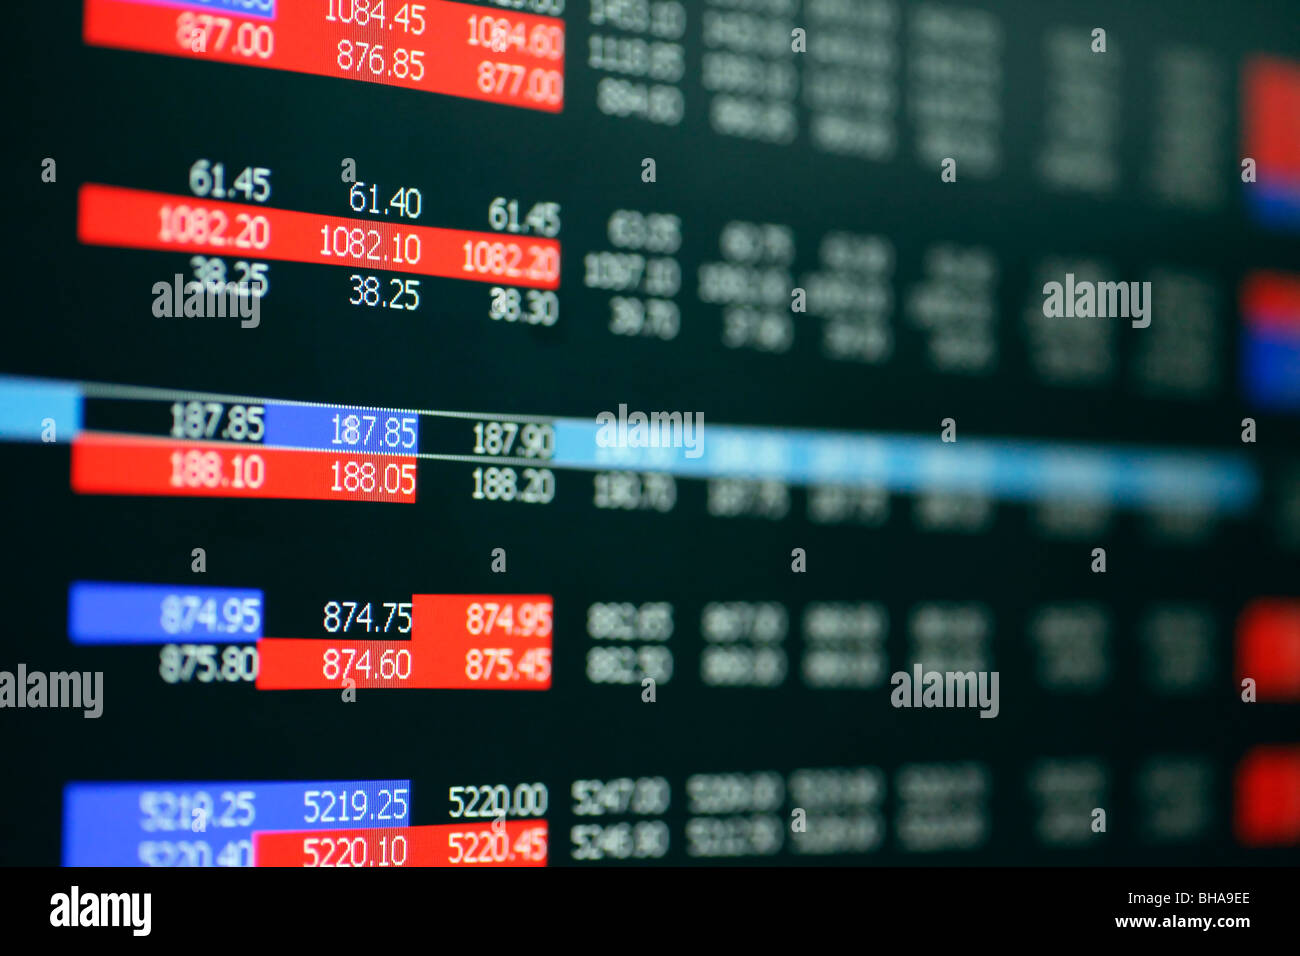 stock-market-online-trading-BHA9EE.jpg